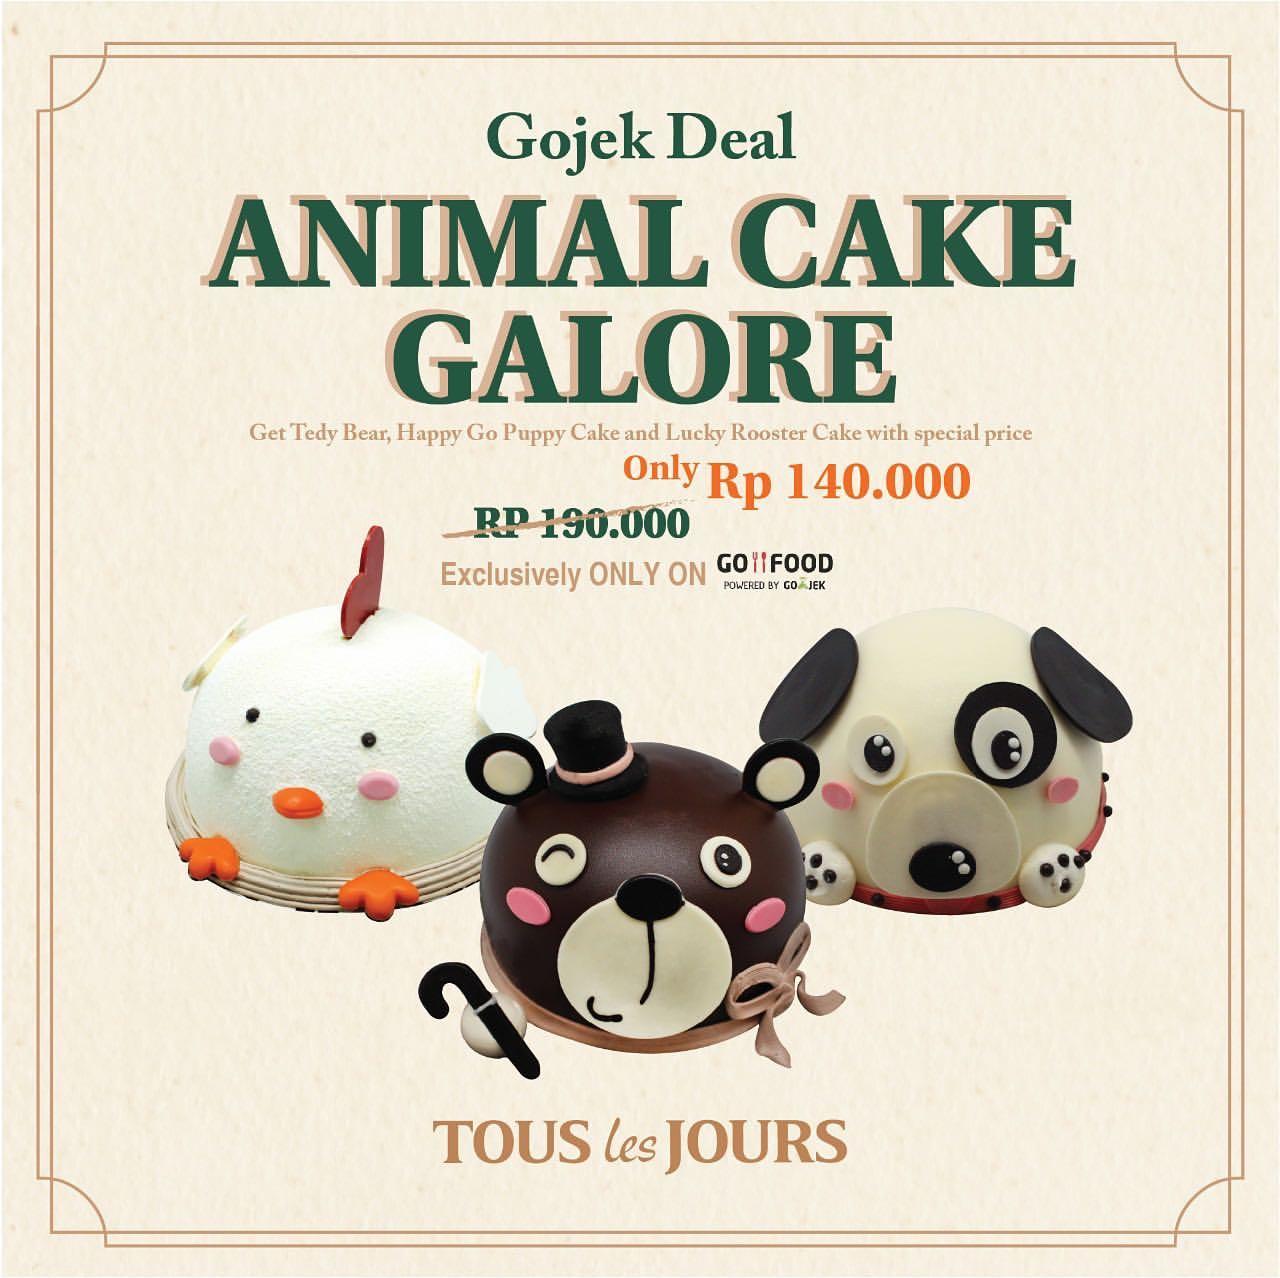 TOUS LES JOURS Animal Cake Galore Diskon 25% khusus Animal Character Cake via GOFOOD